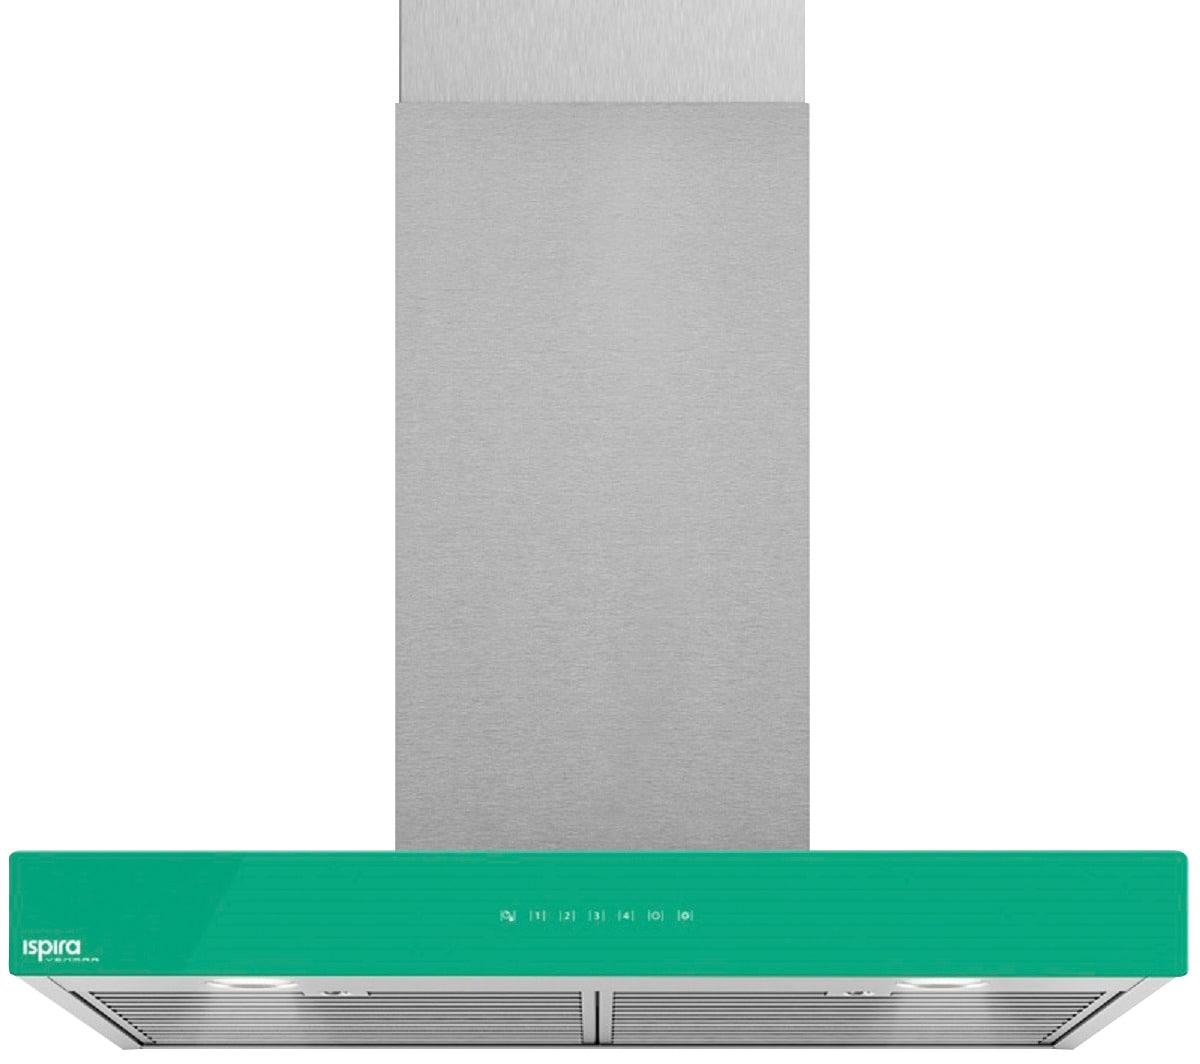 "Venmar Ispira 30"" Chimney Range Hood – Emerald Green"